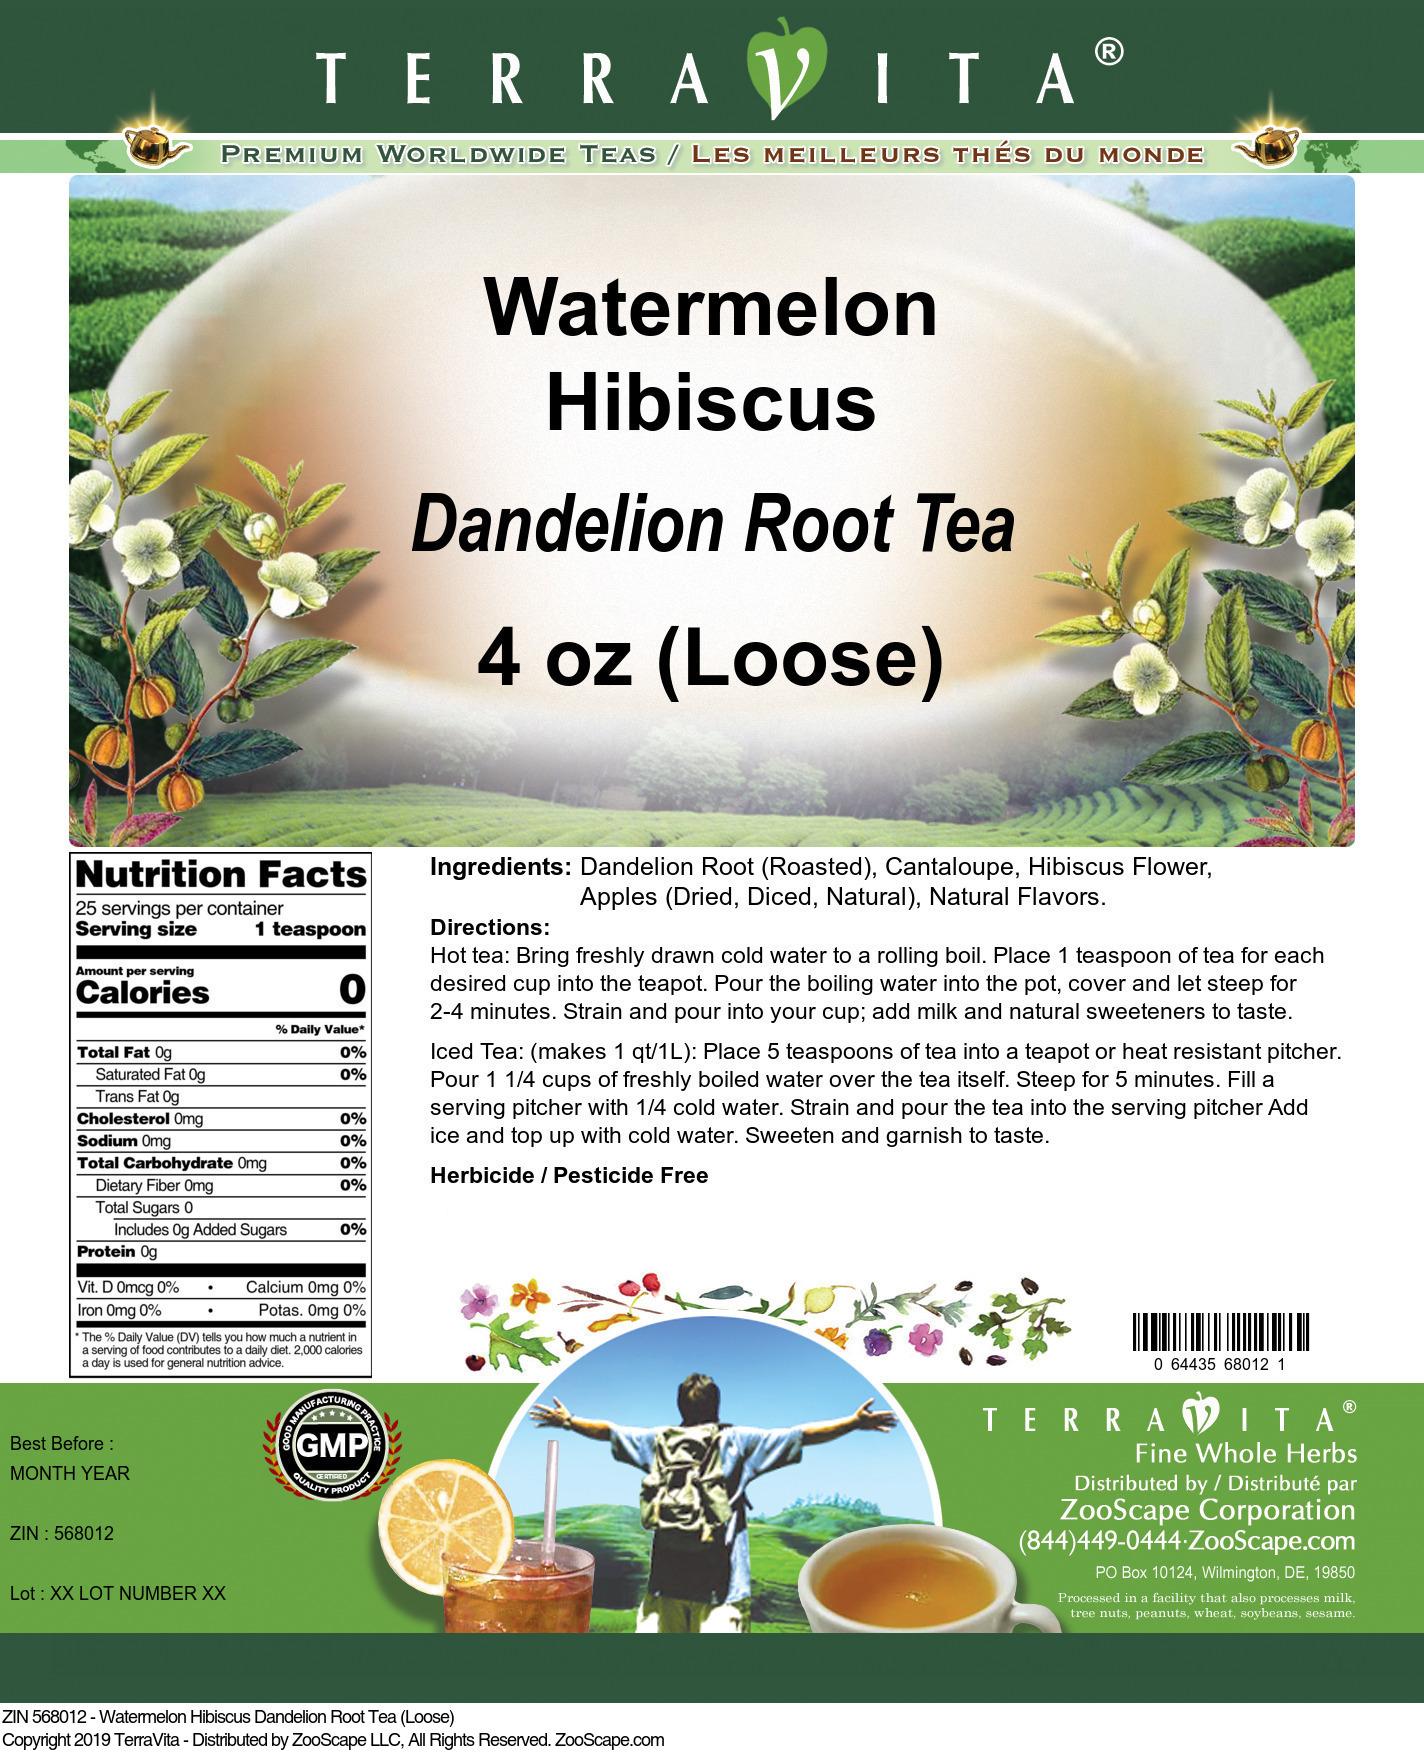 Watermelon Hibiscus Dandelion Root Tea (Loose)